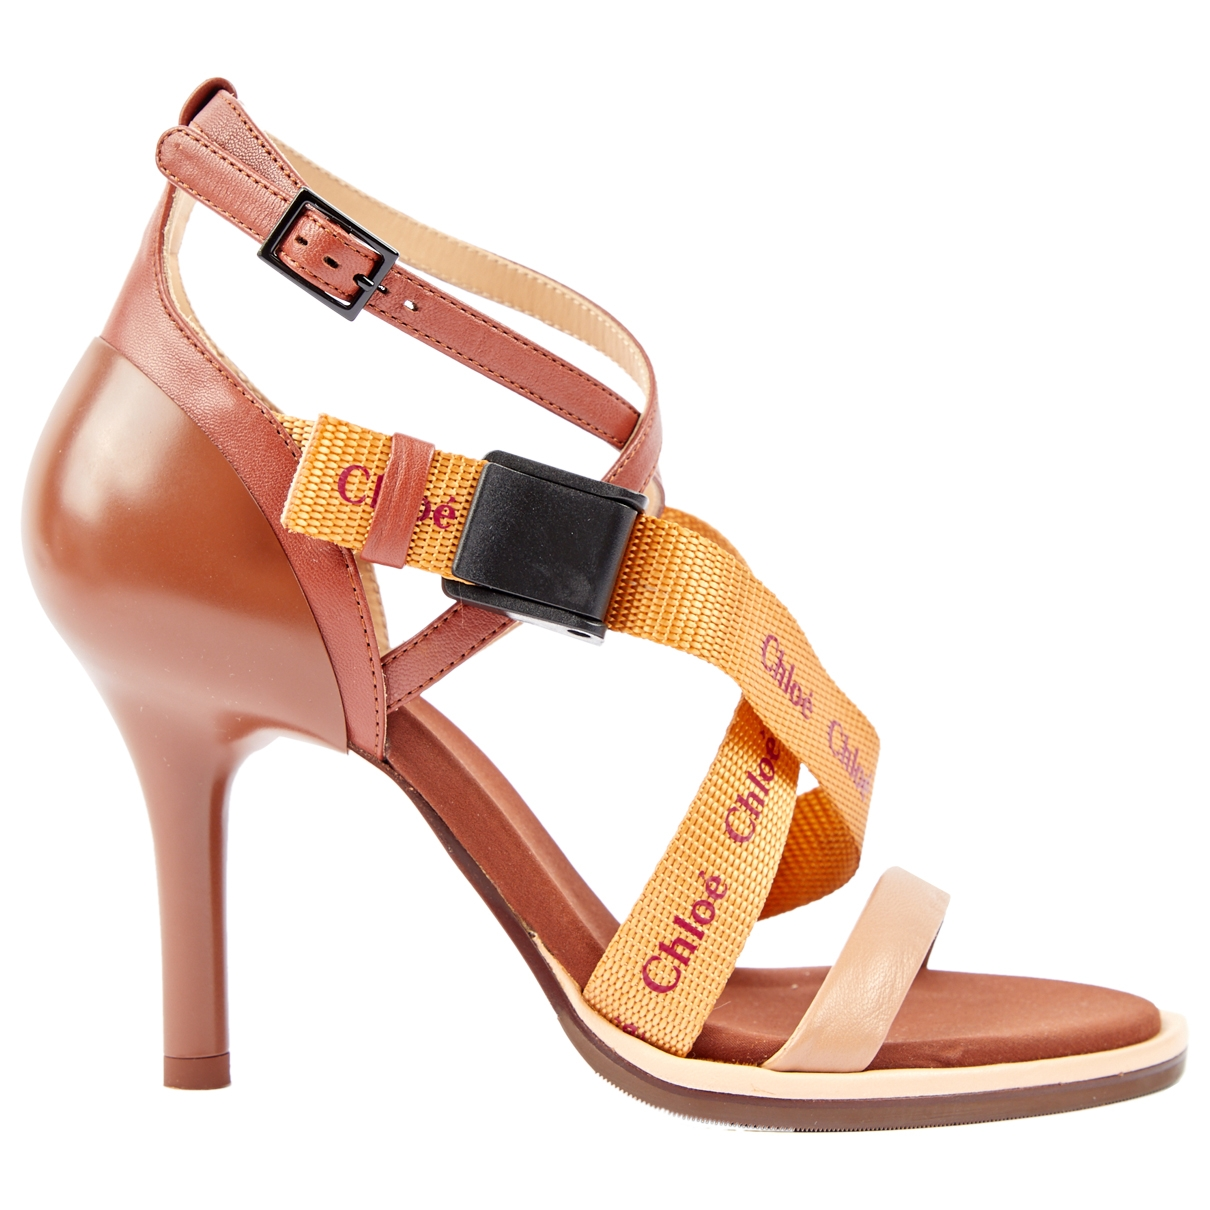 Chloé Veronica Brown Leather Sandals for Women 35 EU